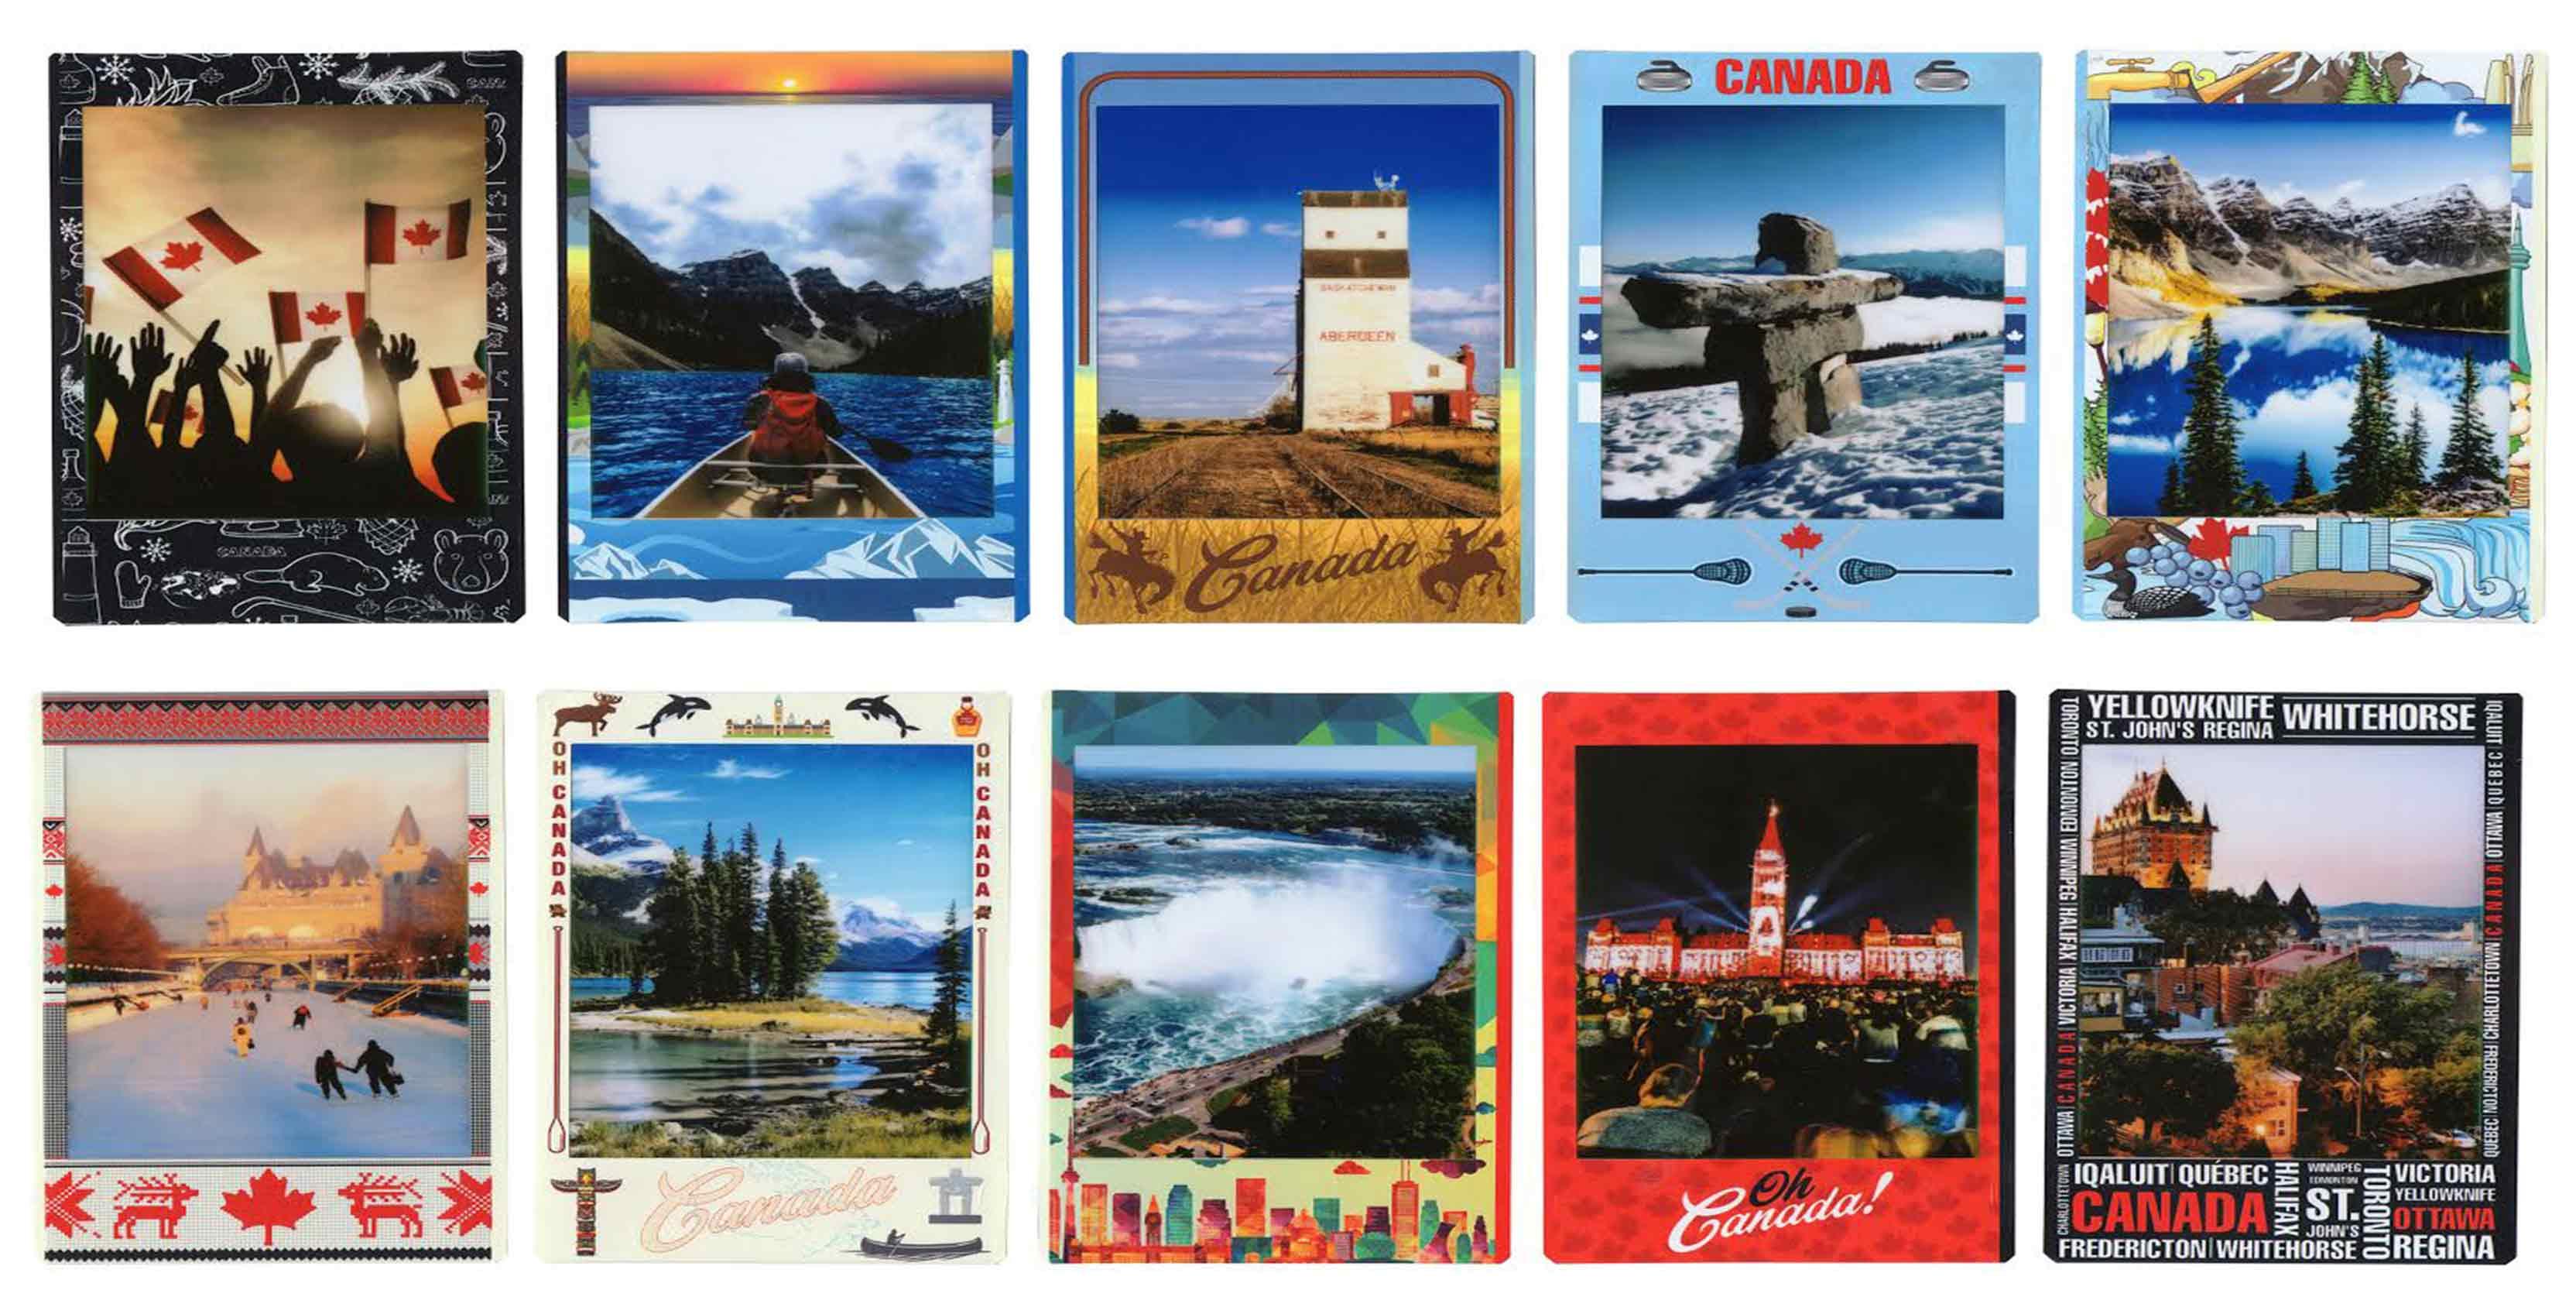 Instax Oh Canada film